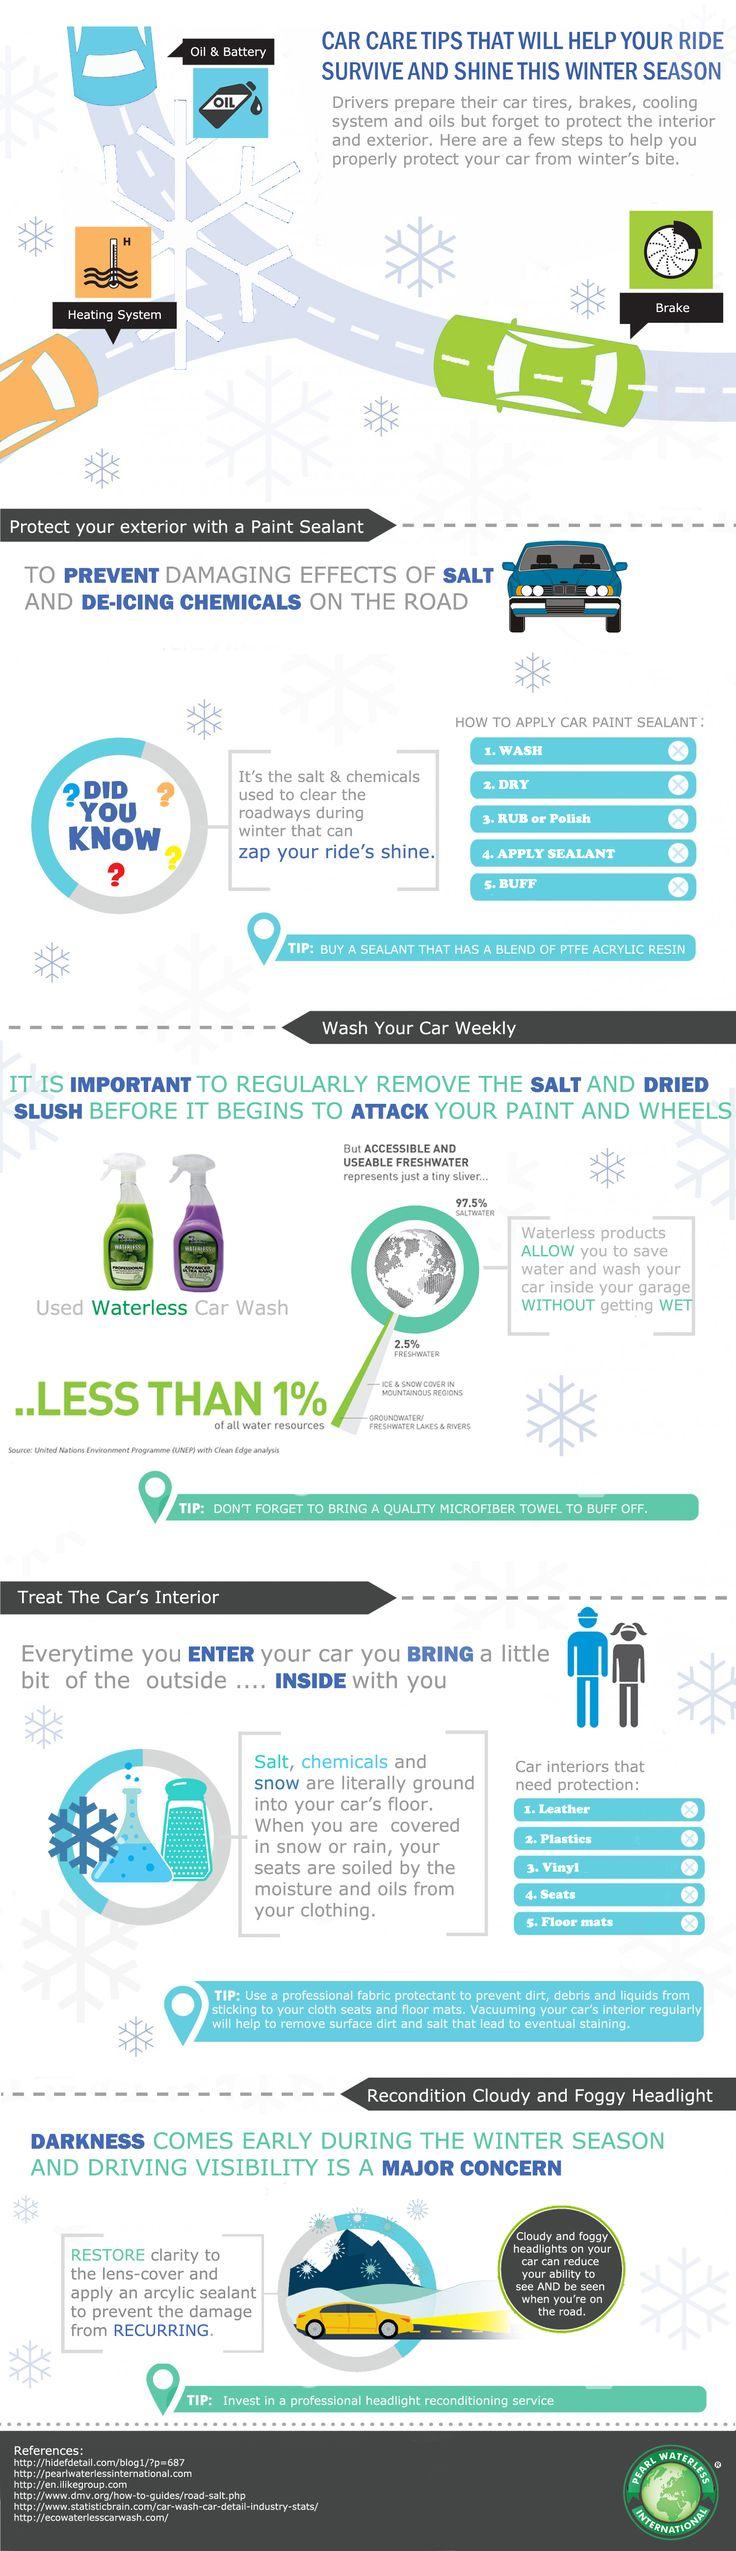 Winter car care tips by pearl waterless car wash pearlwaterlessinternational com